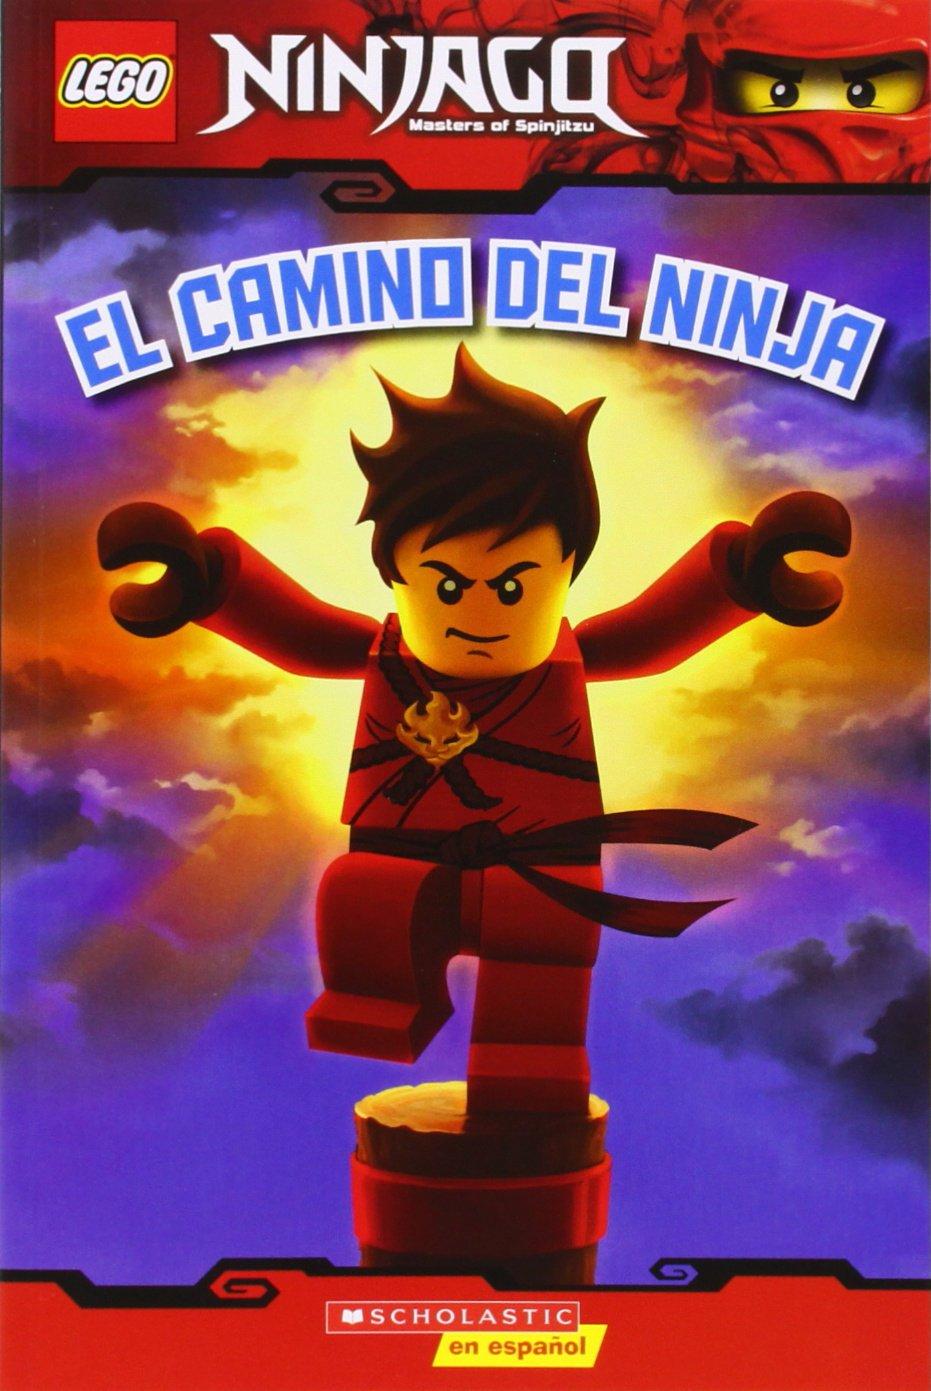 LEGO Ninjago: El camino del ninja (Lector #1): (Spanish language edition of LEGO Ninjago: Way of the Ninja) (Spanish Edition) by Brand: Scholastic en Espanol